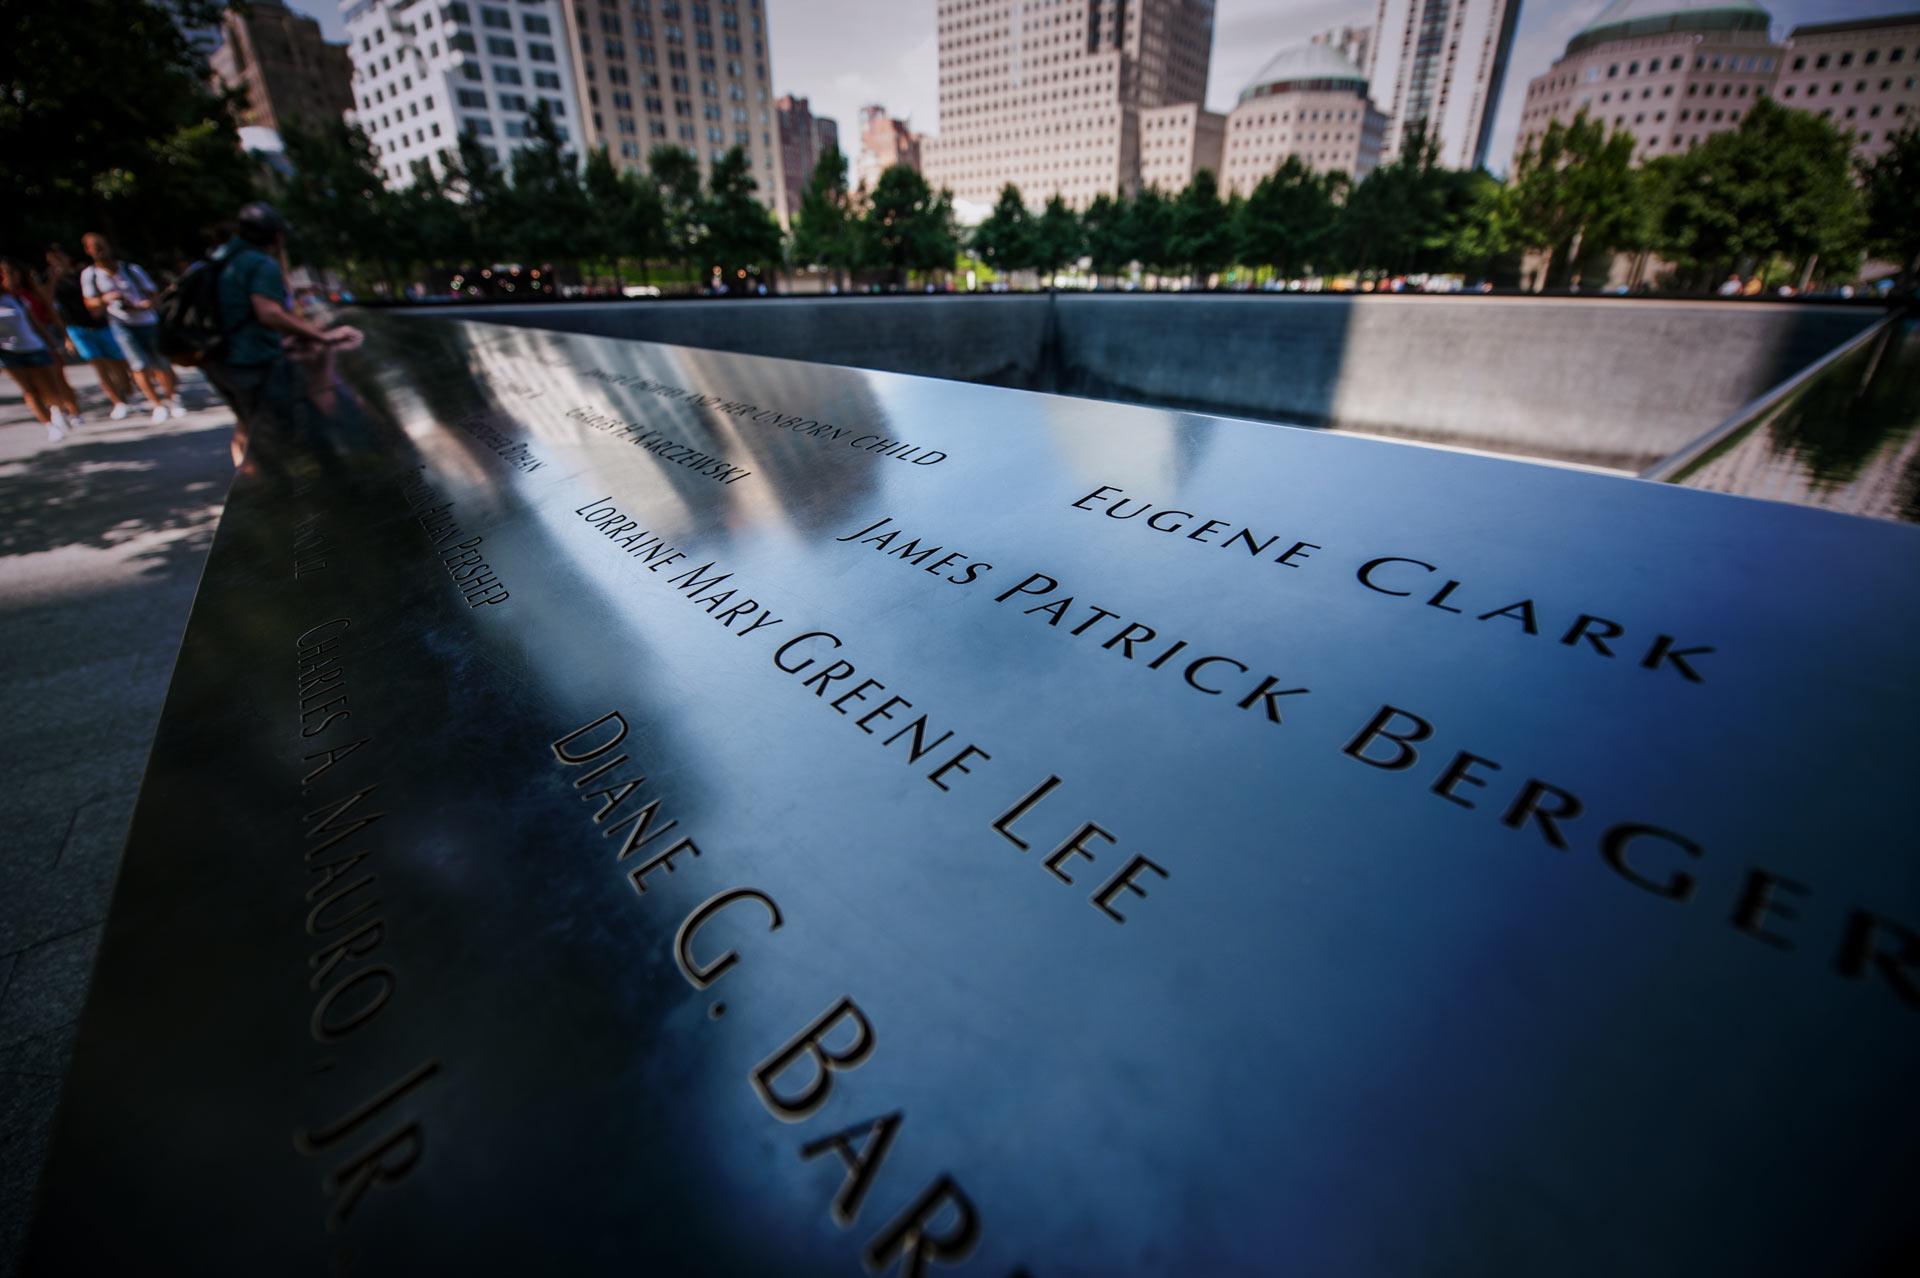 Reflecting Pool at at National September 11 Memorial & Museum in New York, NY, USA